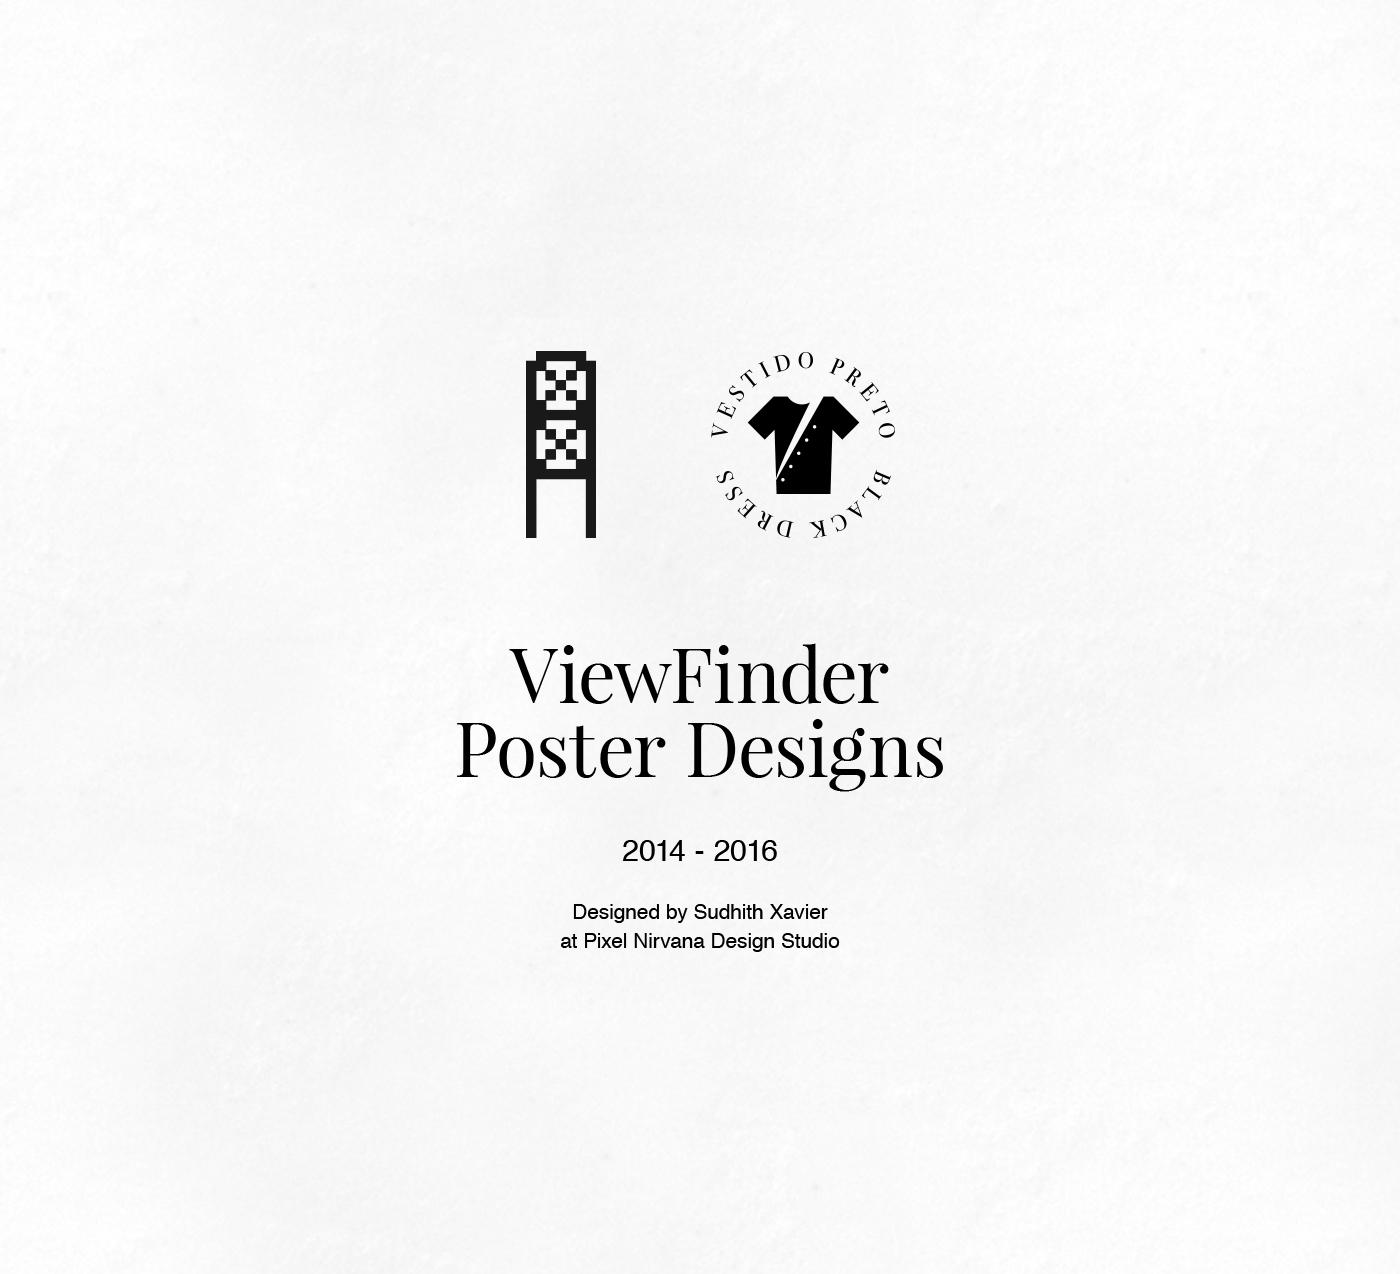 Kochi - Muziris Kochi-Muziris Biennale Poster Design custom type HAND LETTERING indie posters India illustrated posters Biennale photowalk